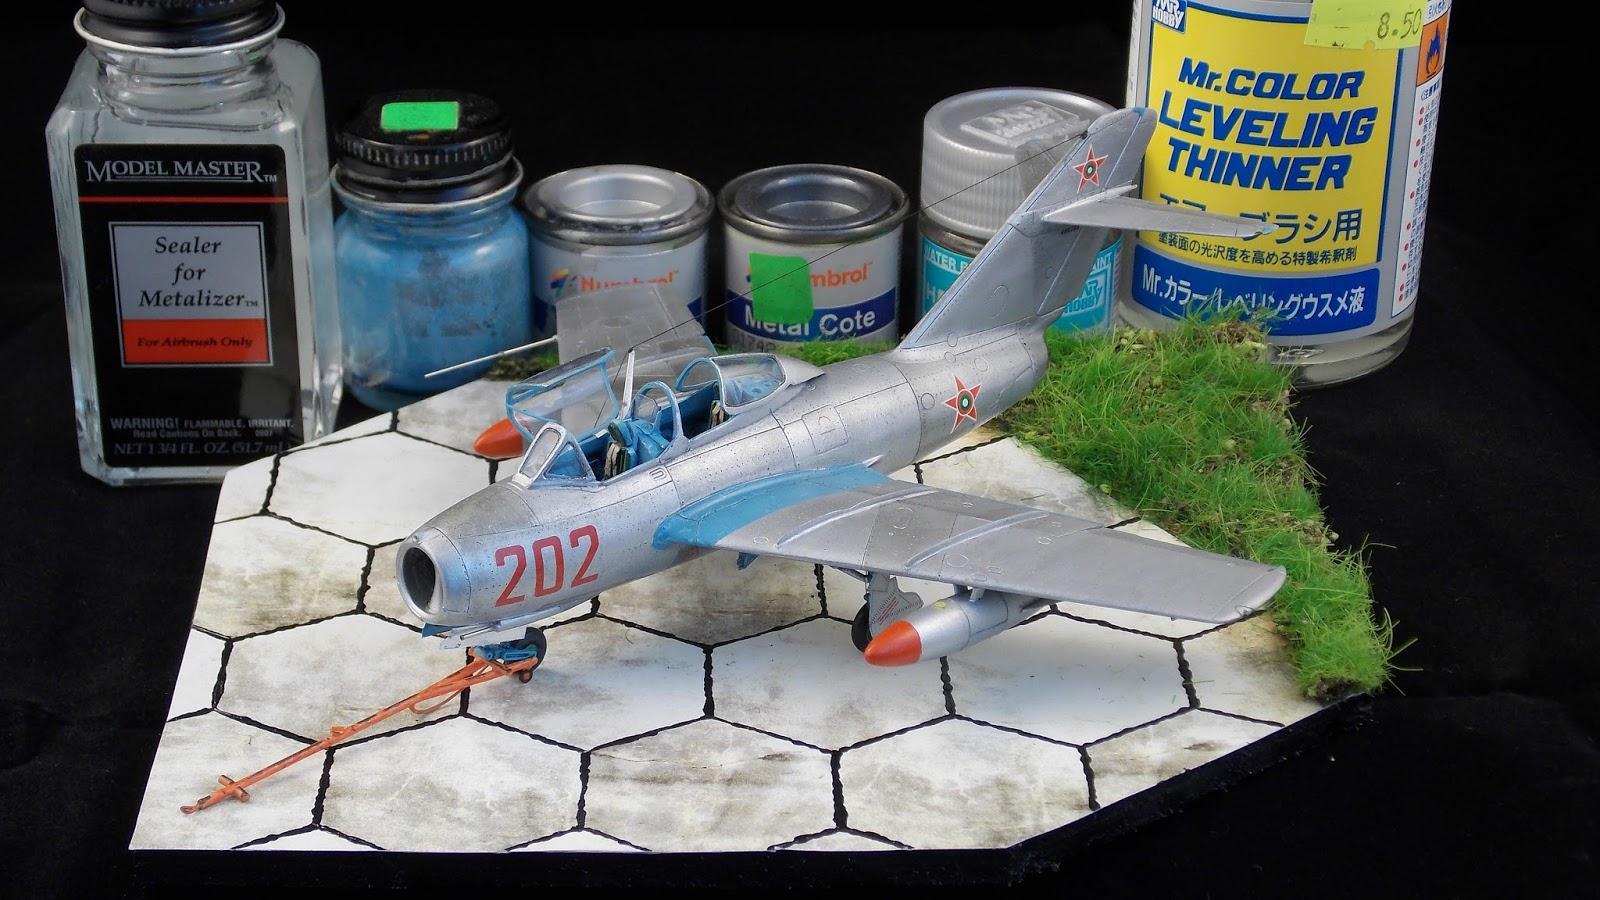 MiG - 15 Uti hobby boss 1:72